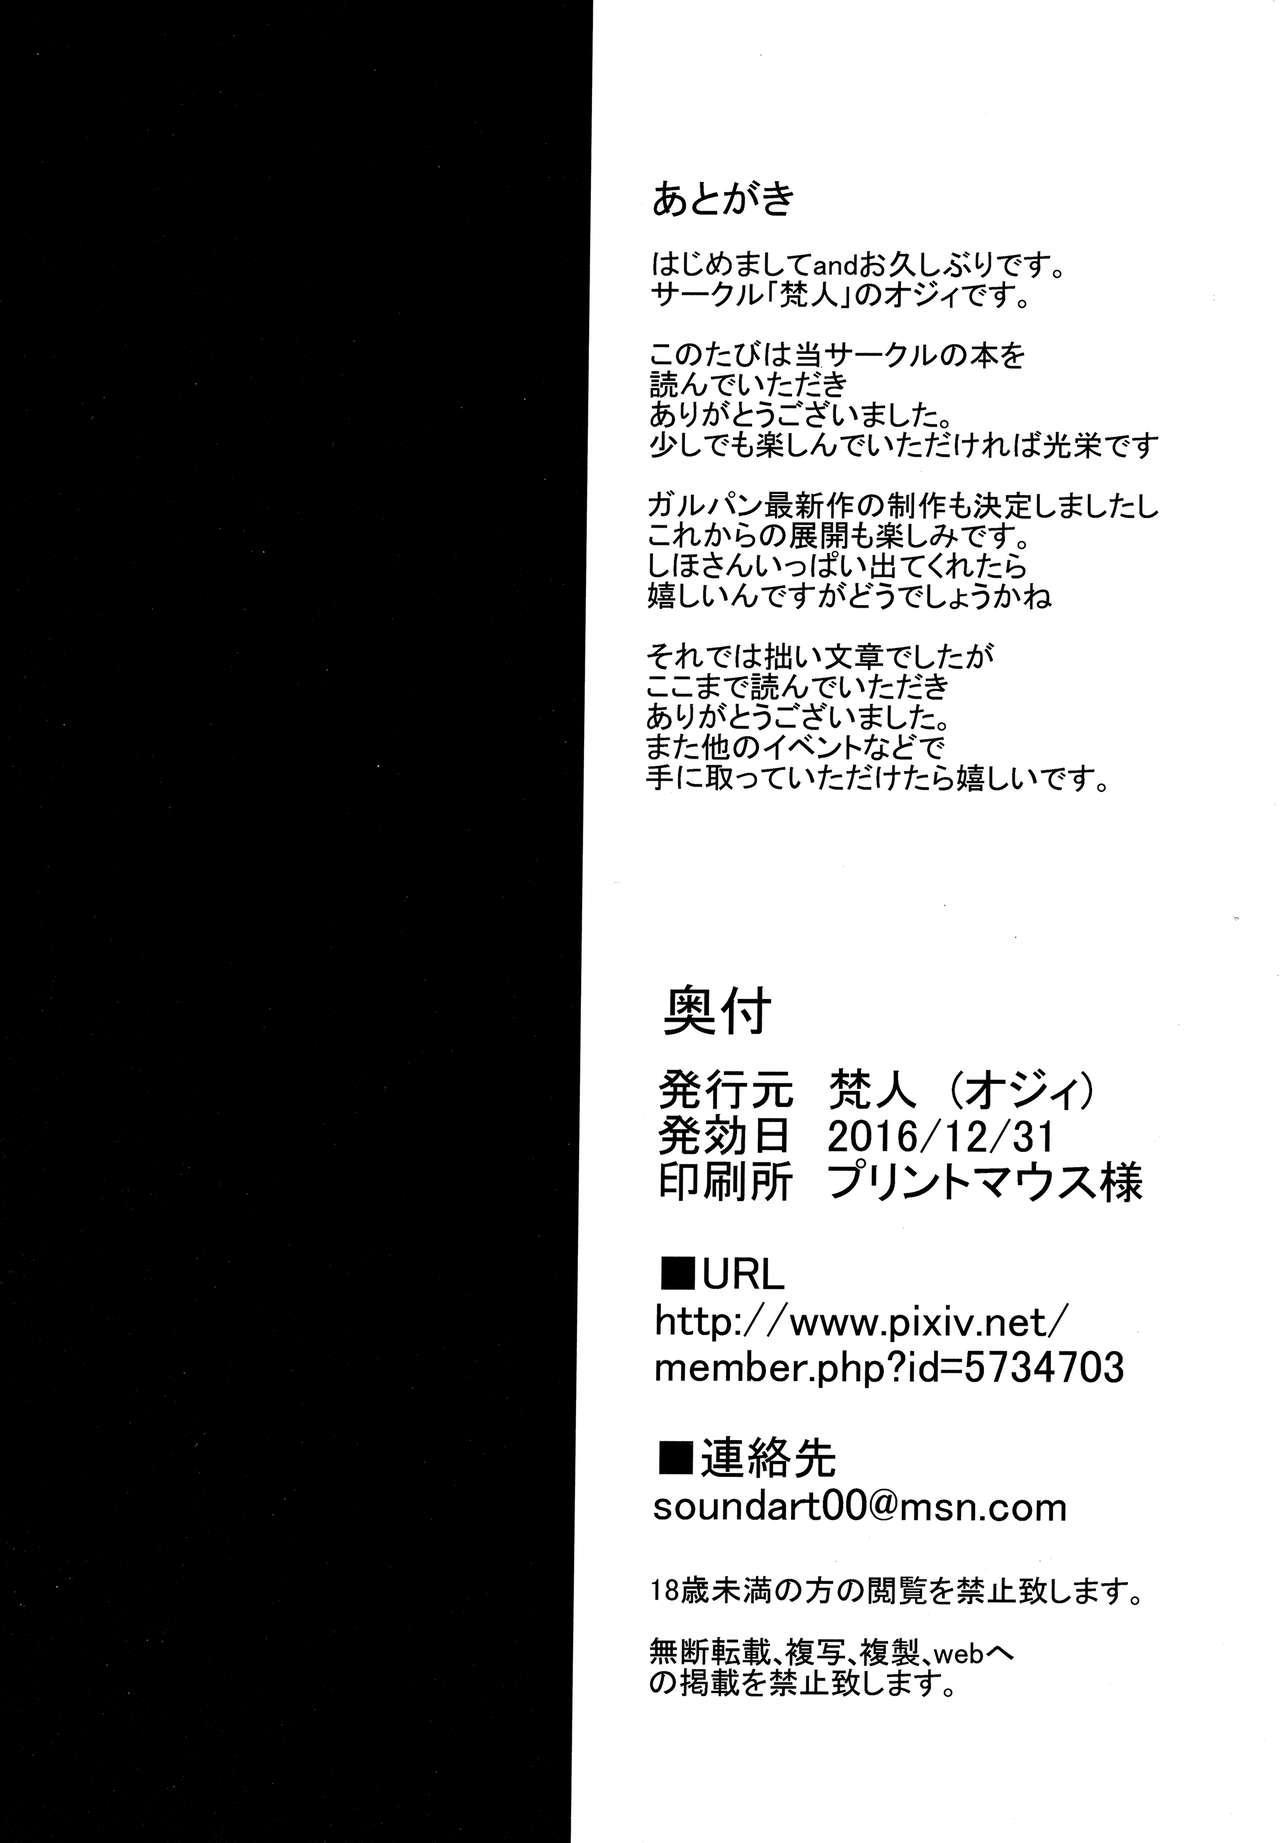 Shihokan 16